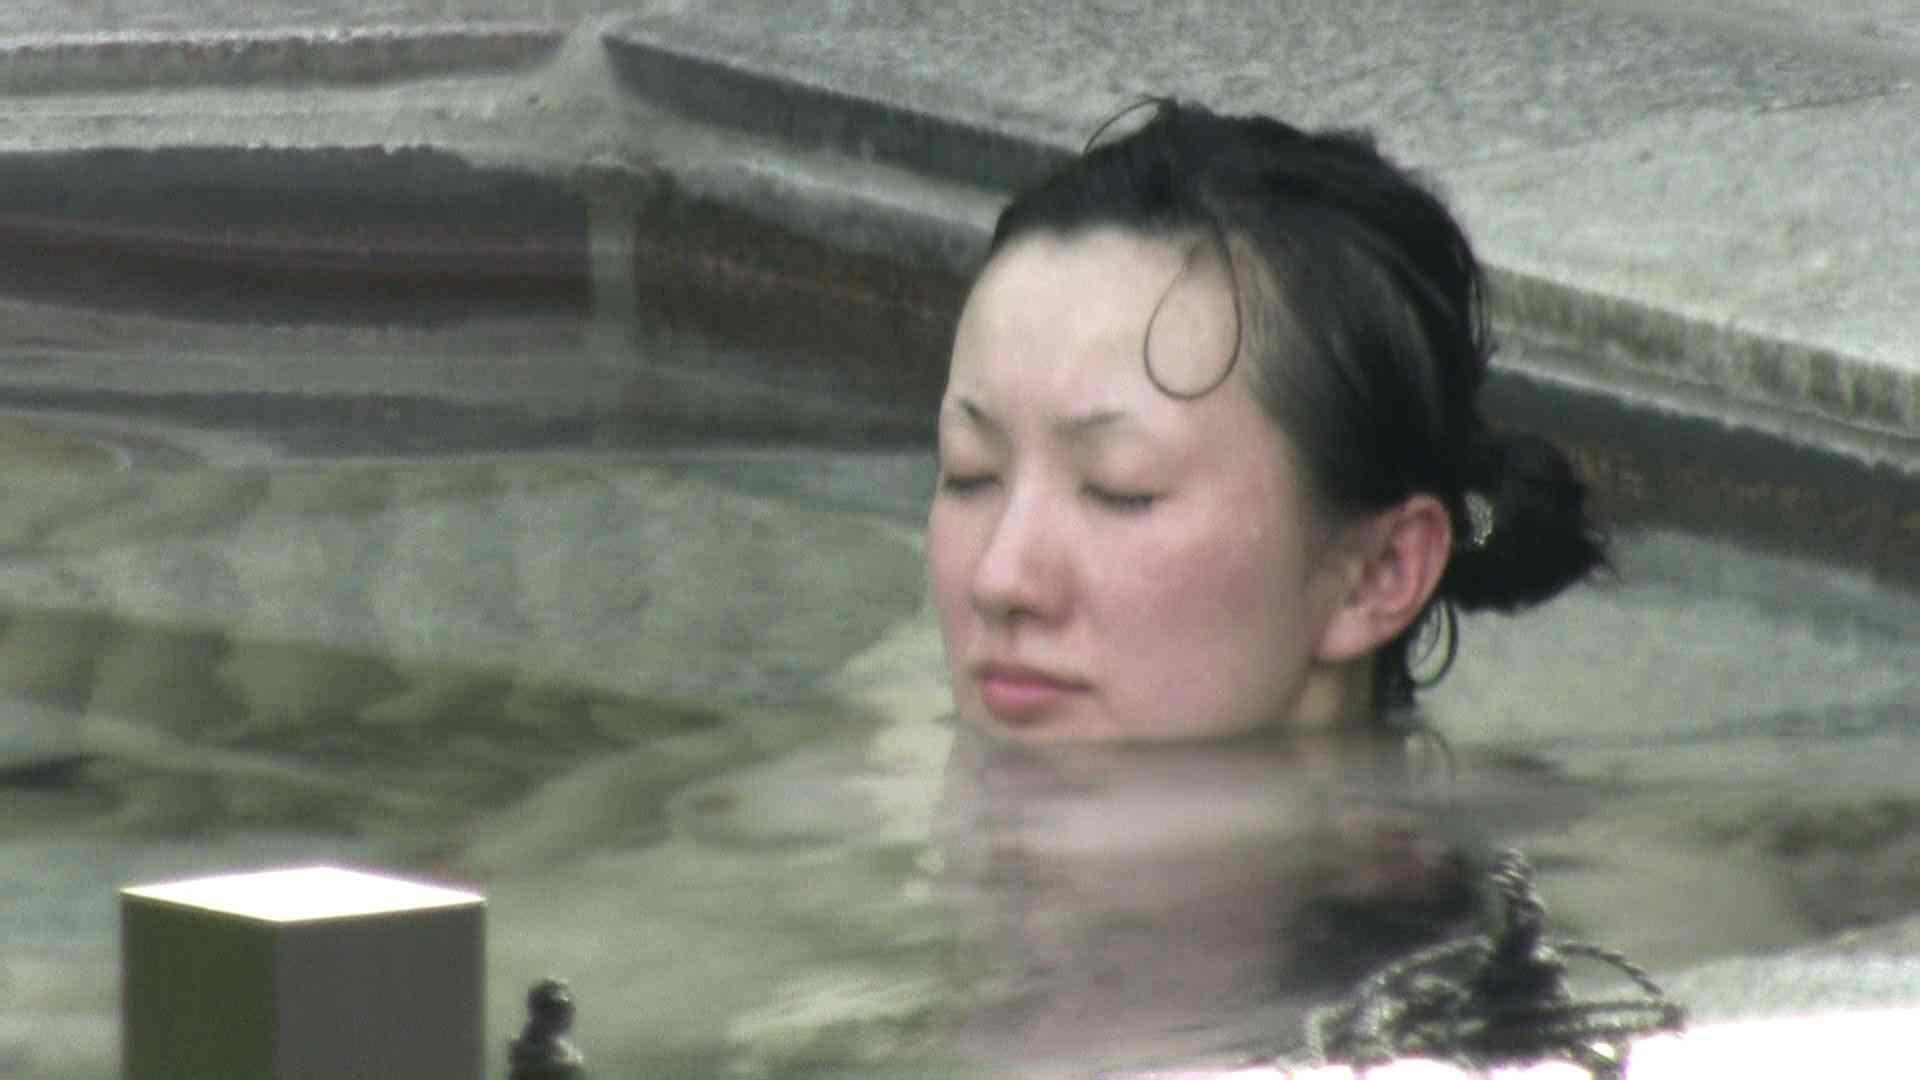 Aquaな露天風呂Vol.663 露天風呂編  77PIX 4